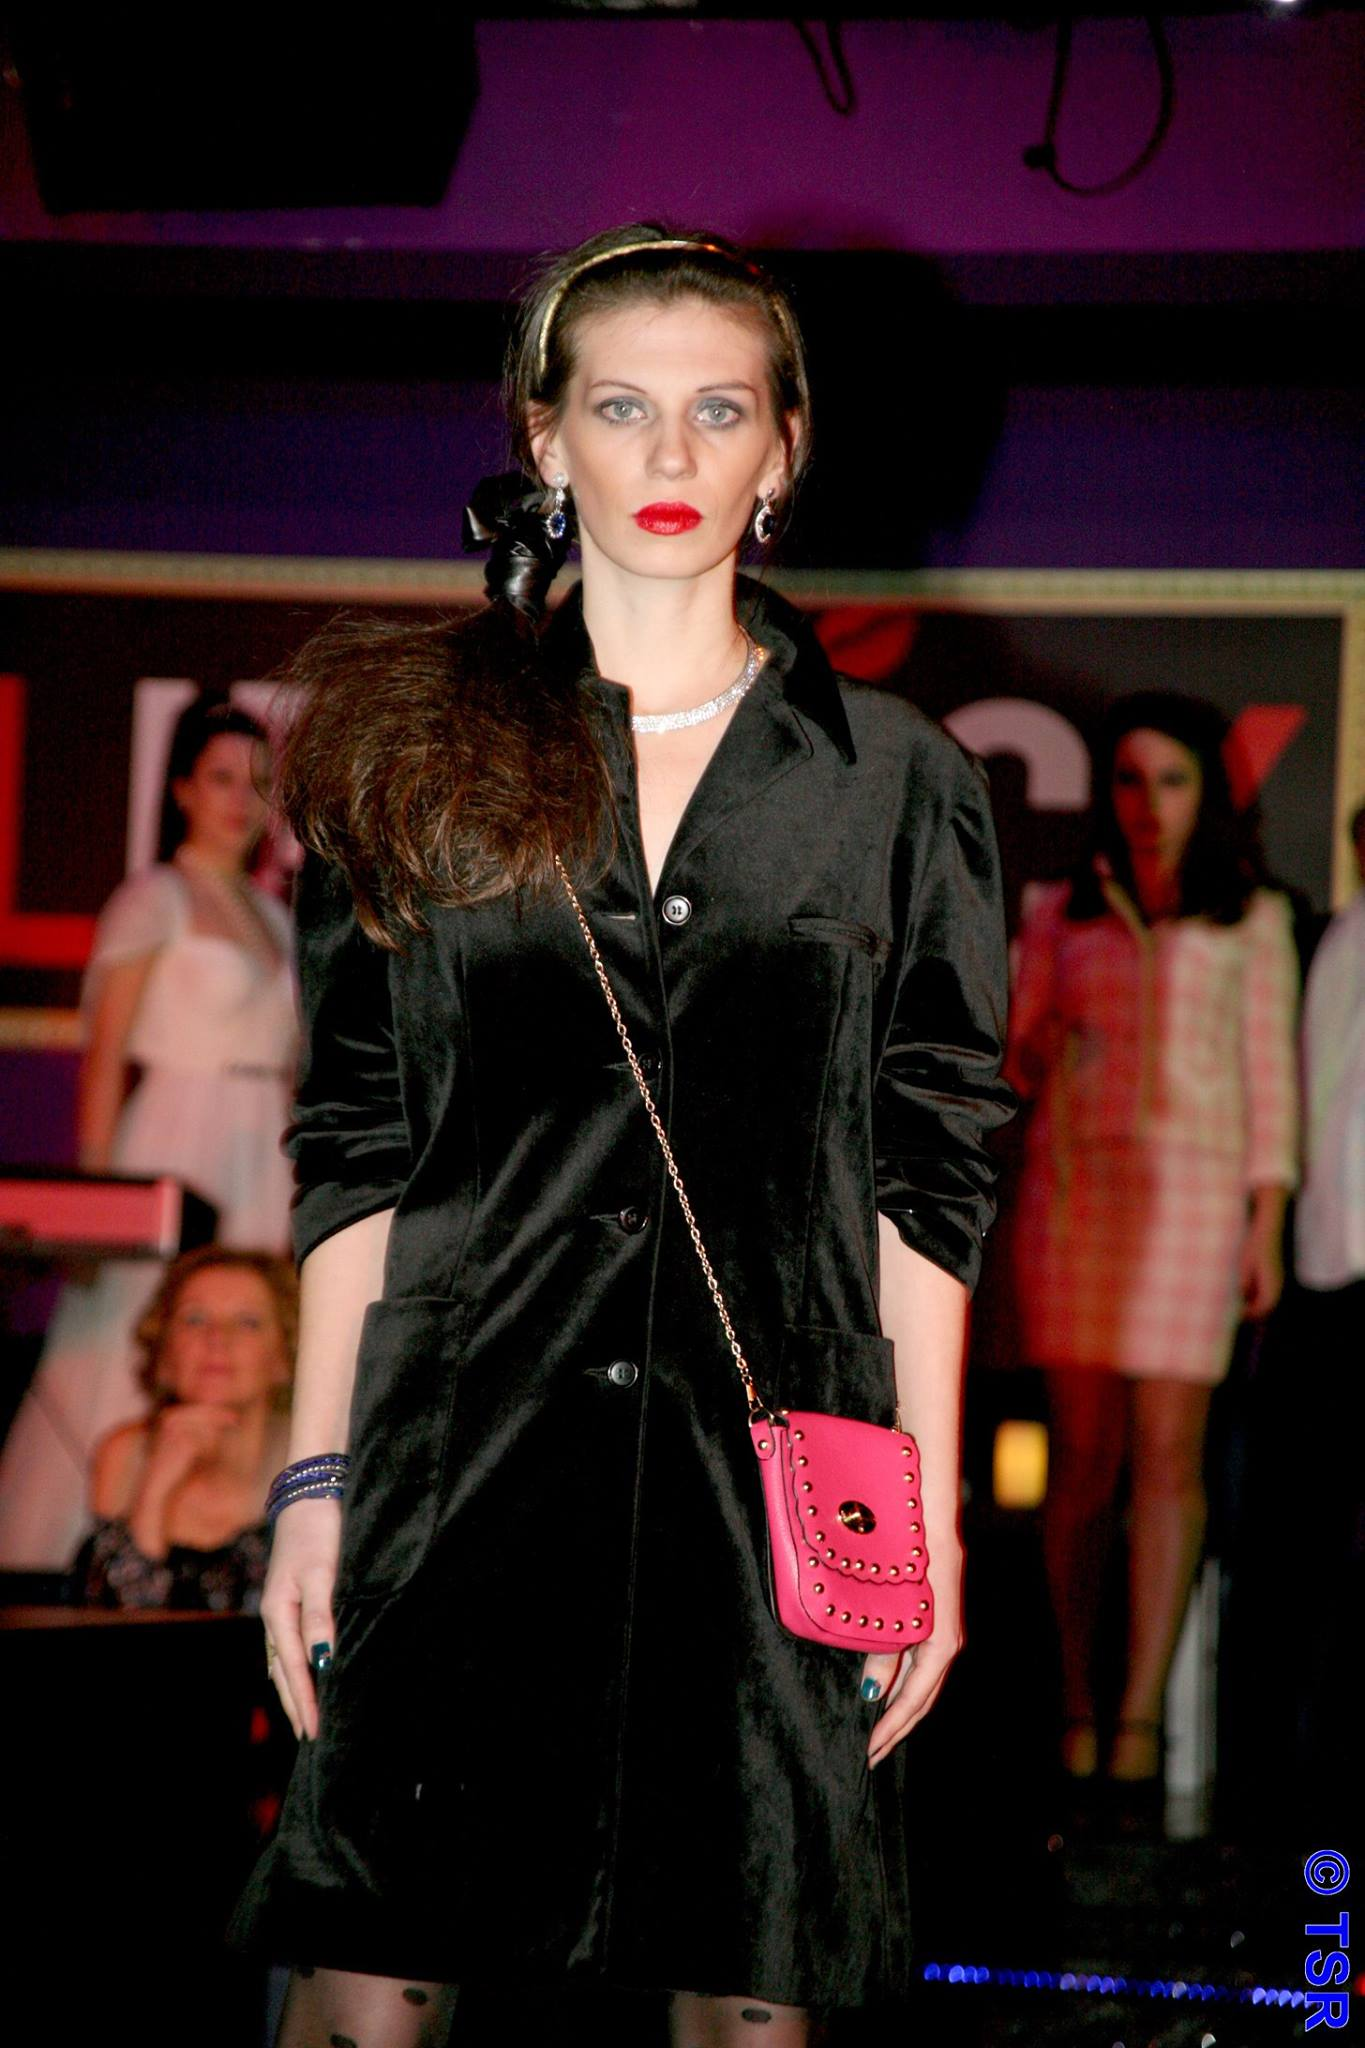 MY OUTFIT  Moda anilor '70:  Sacou negru de catifea